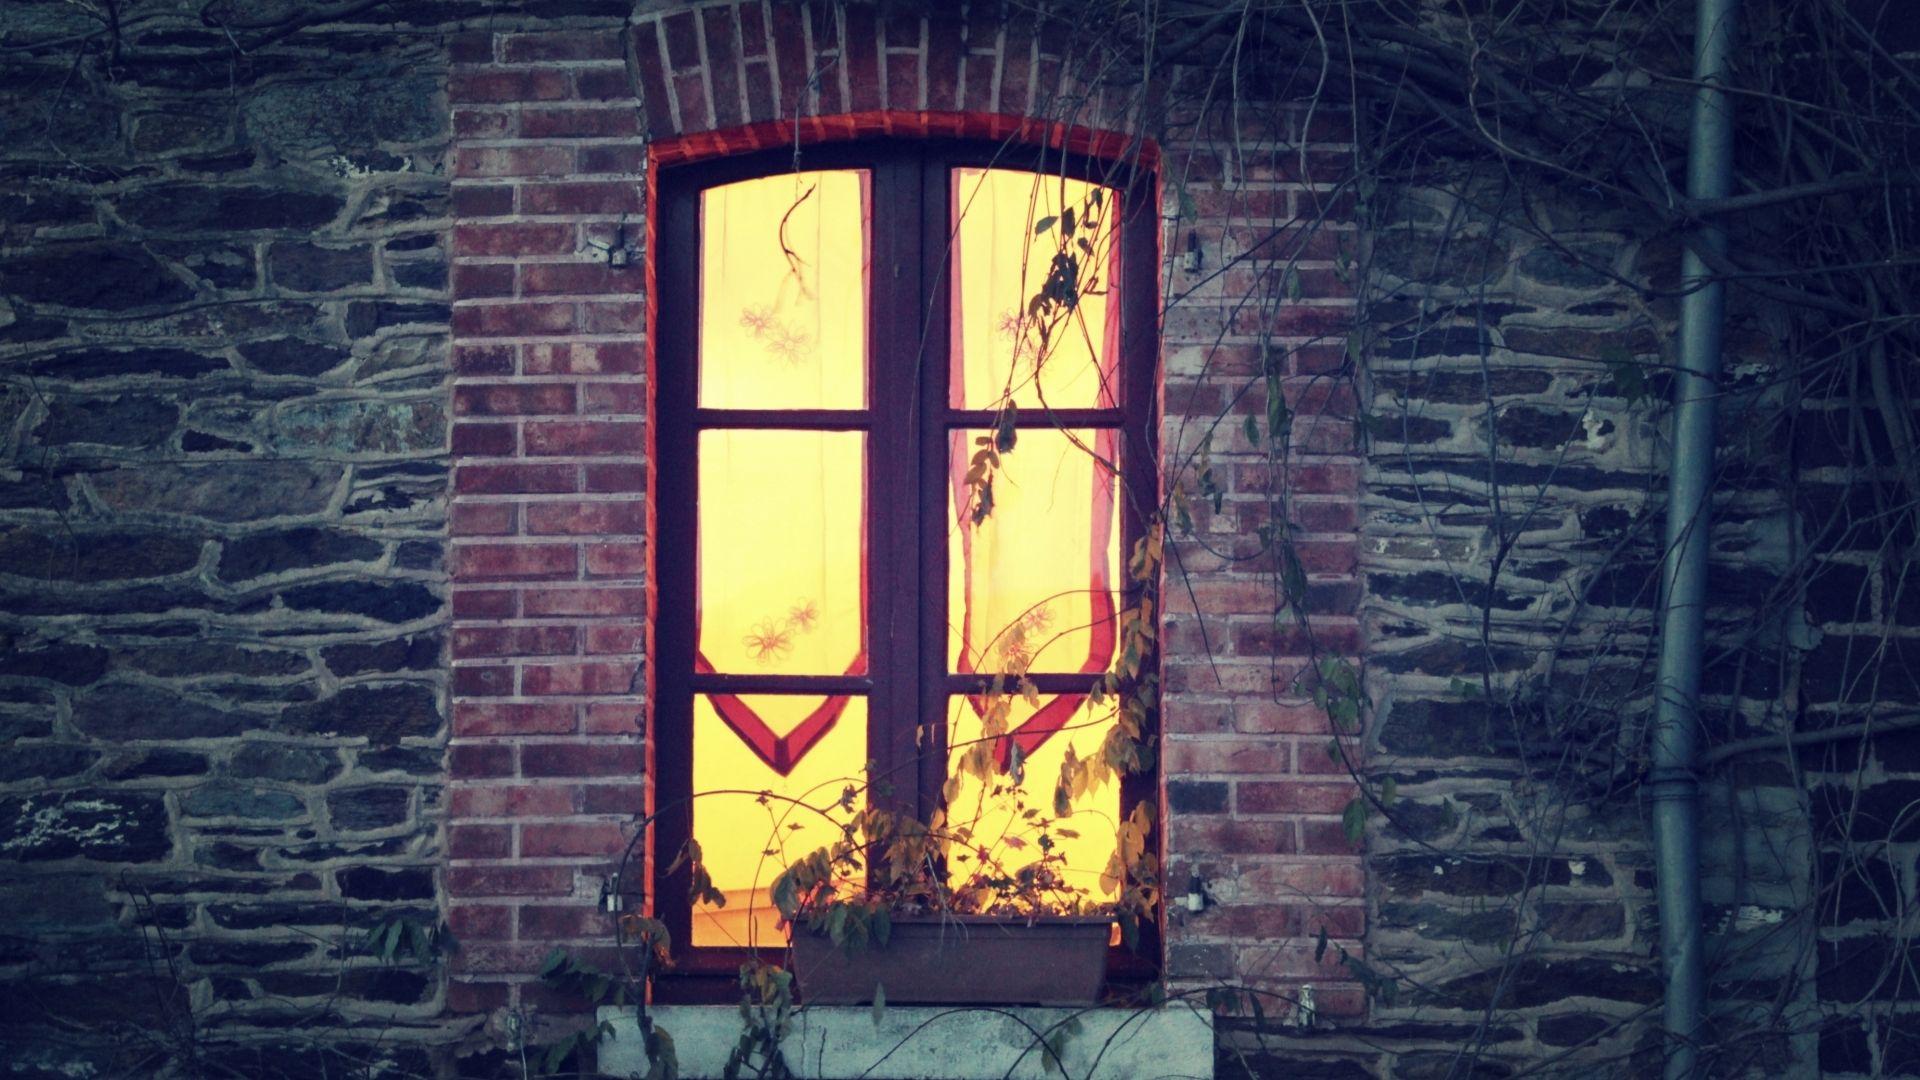 Vintage Old Window Home HD Wallpaper Window mria ROSA